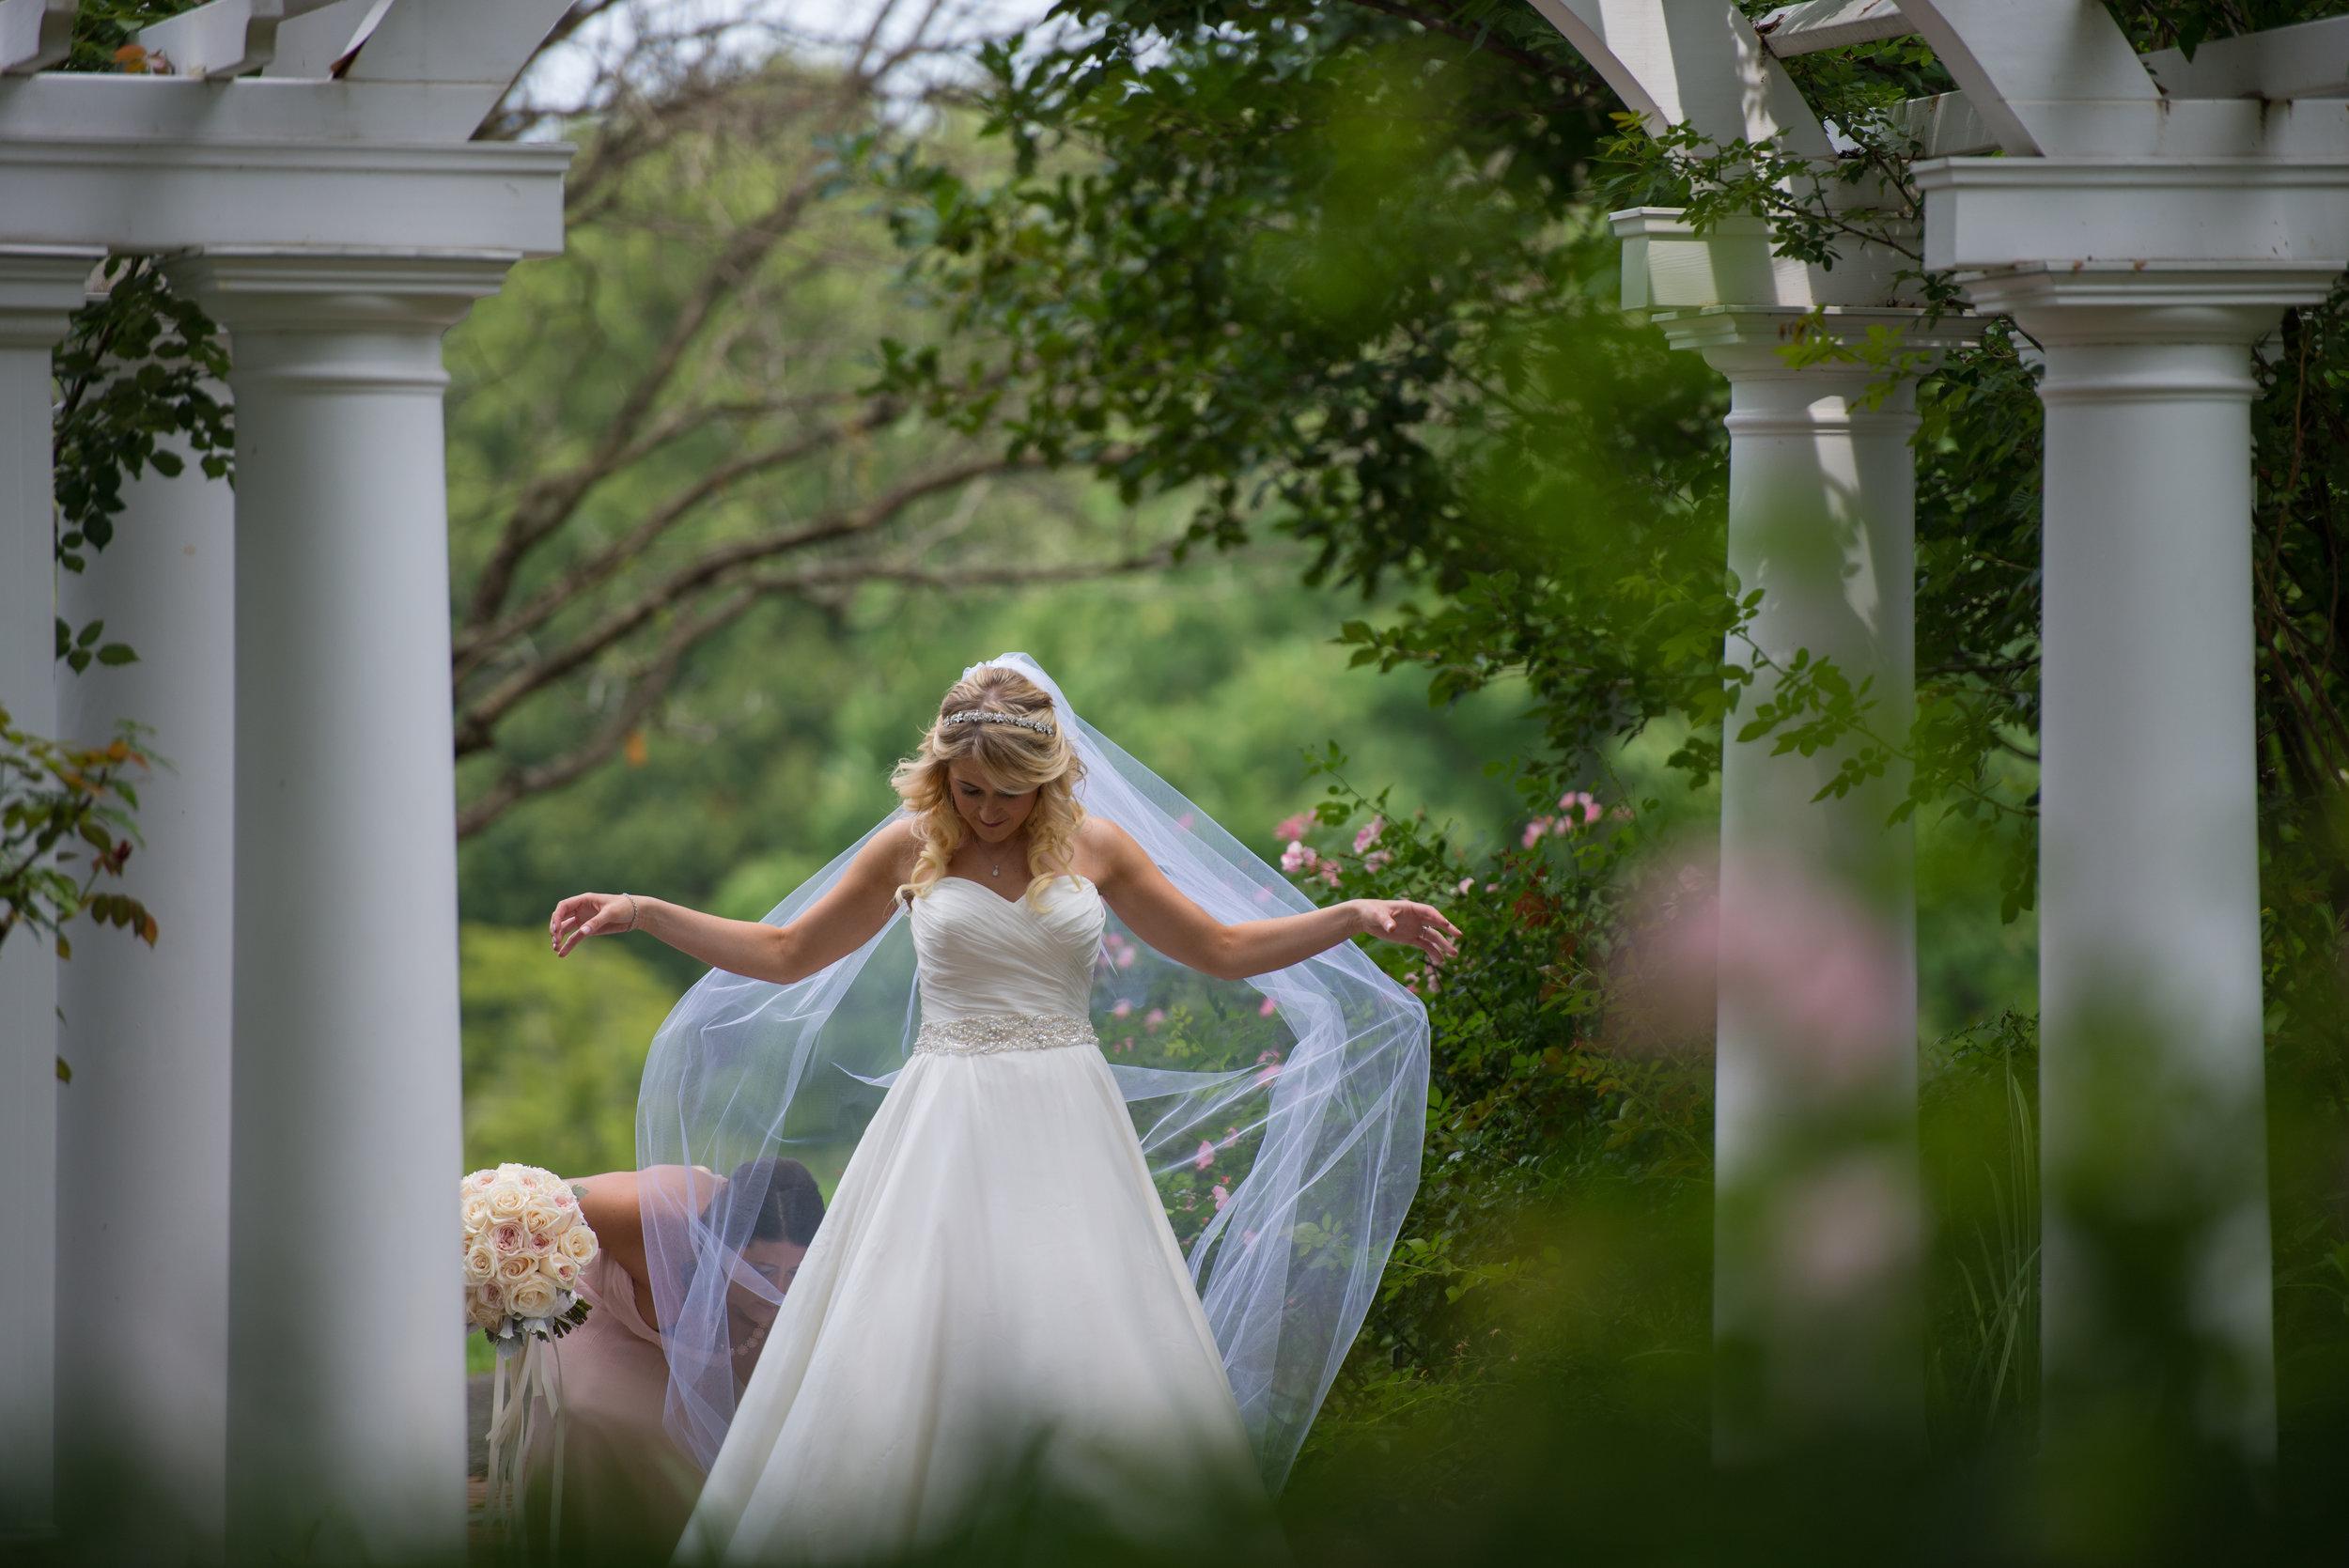 Wedding First Look Photos00904.jpg